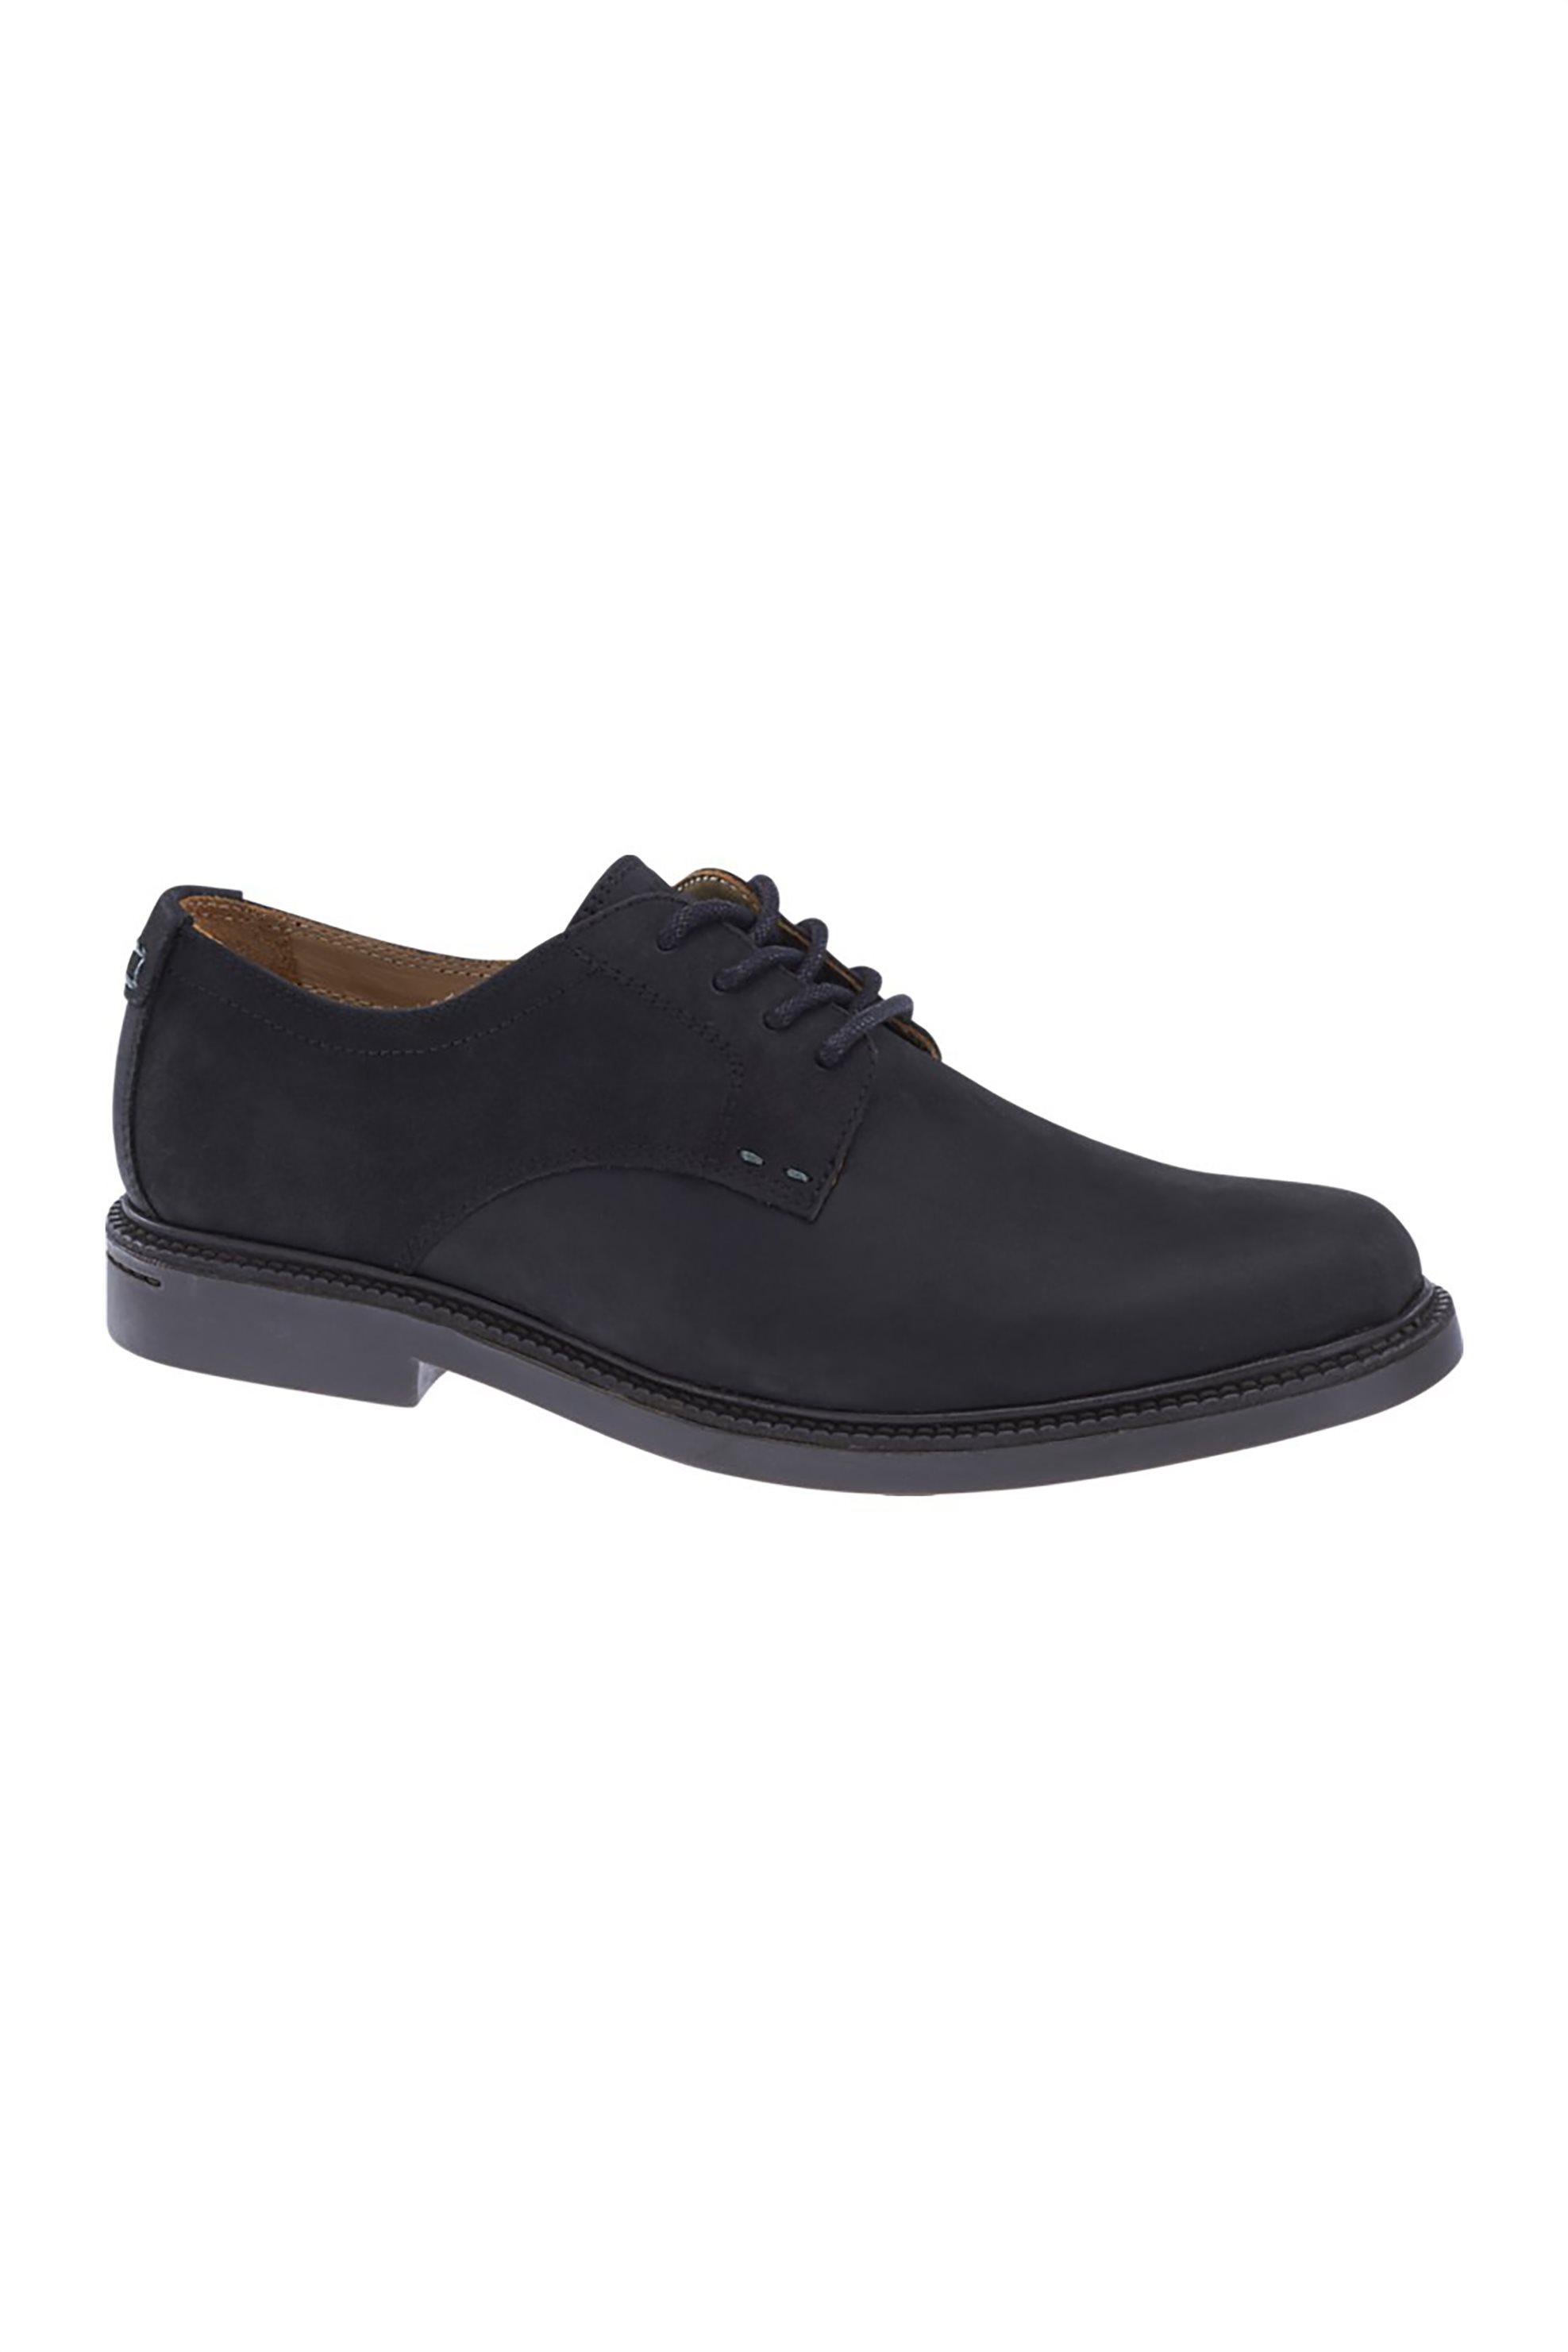 Notos Sebago ανδρικά παπούτσια δερμάτινα Turner Lace Up – B810260 – Μαύρο e180df86b2e